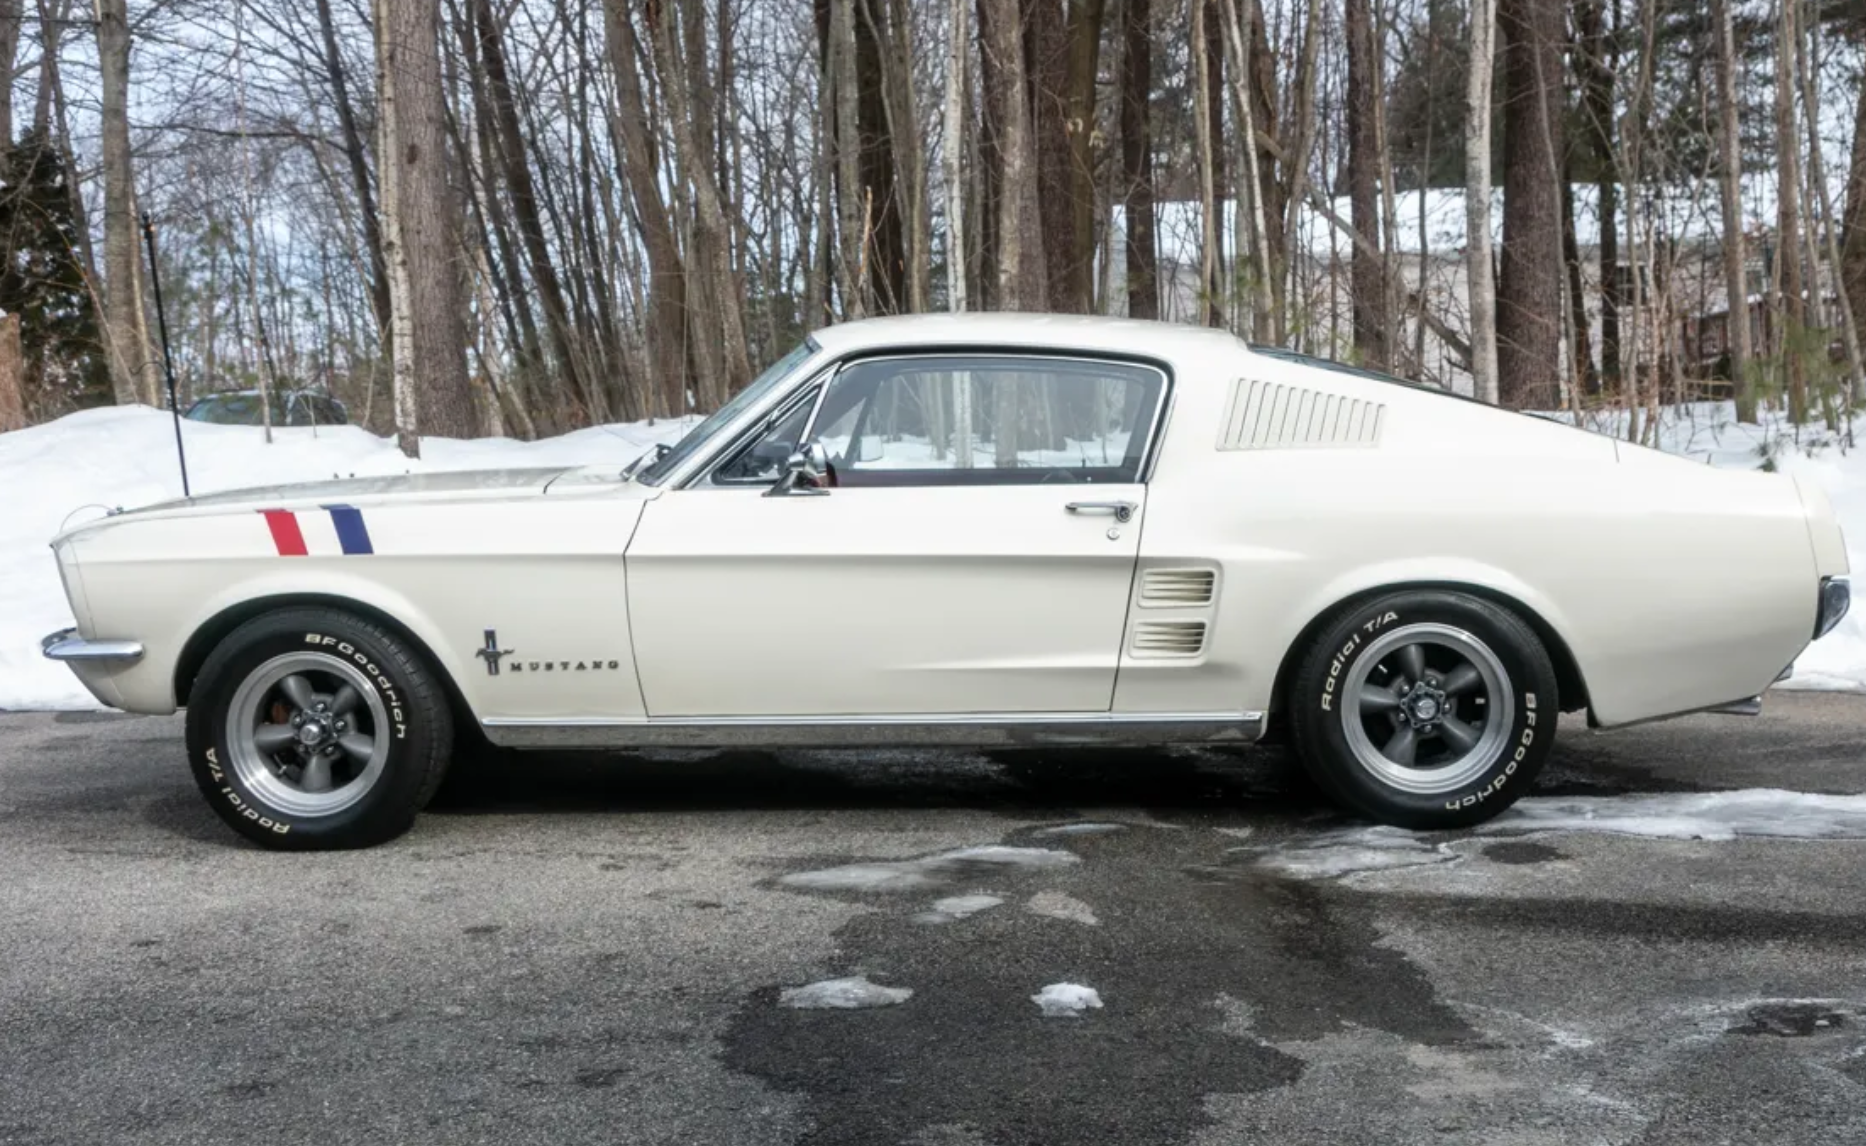 1966 Mustang Fastback For Sale Craigslist